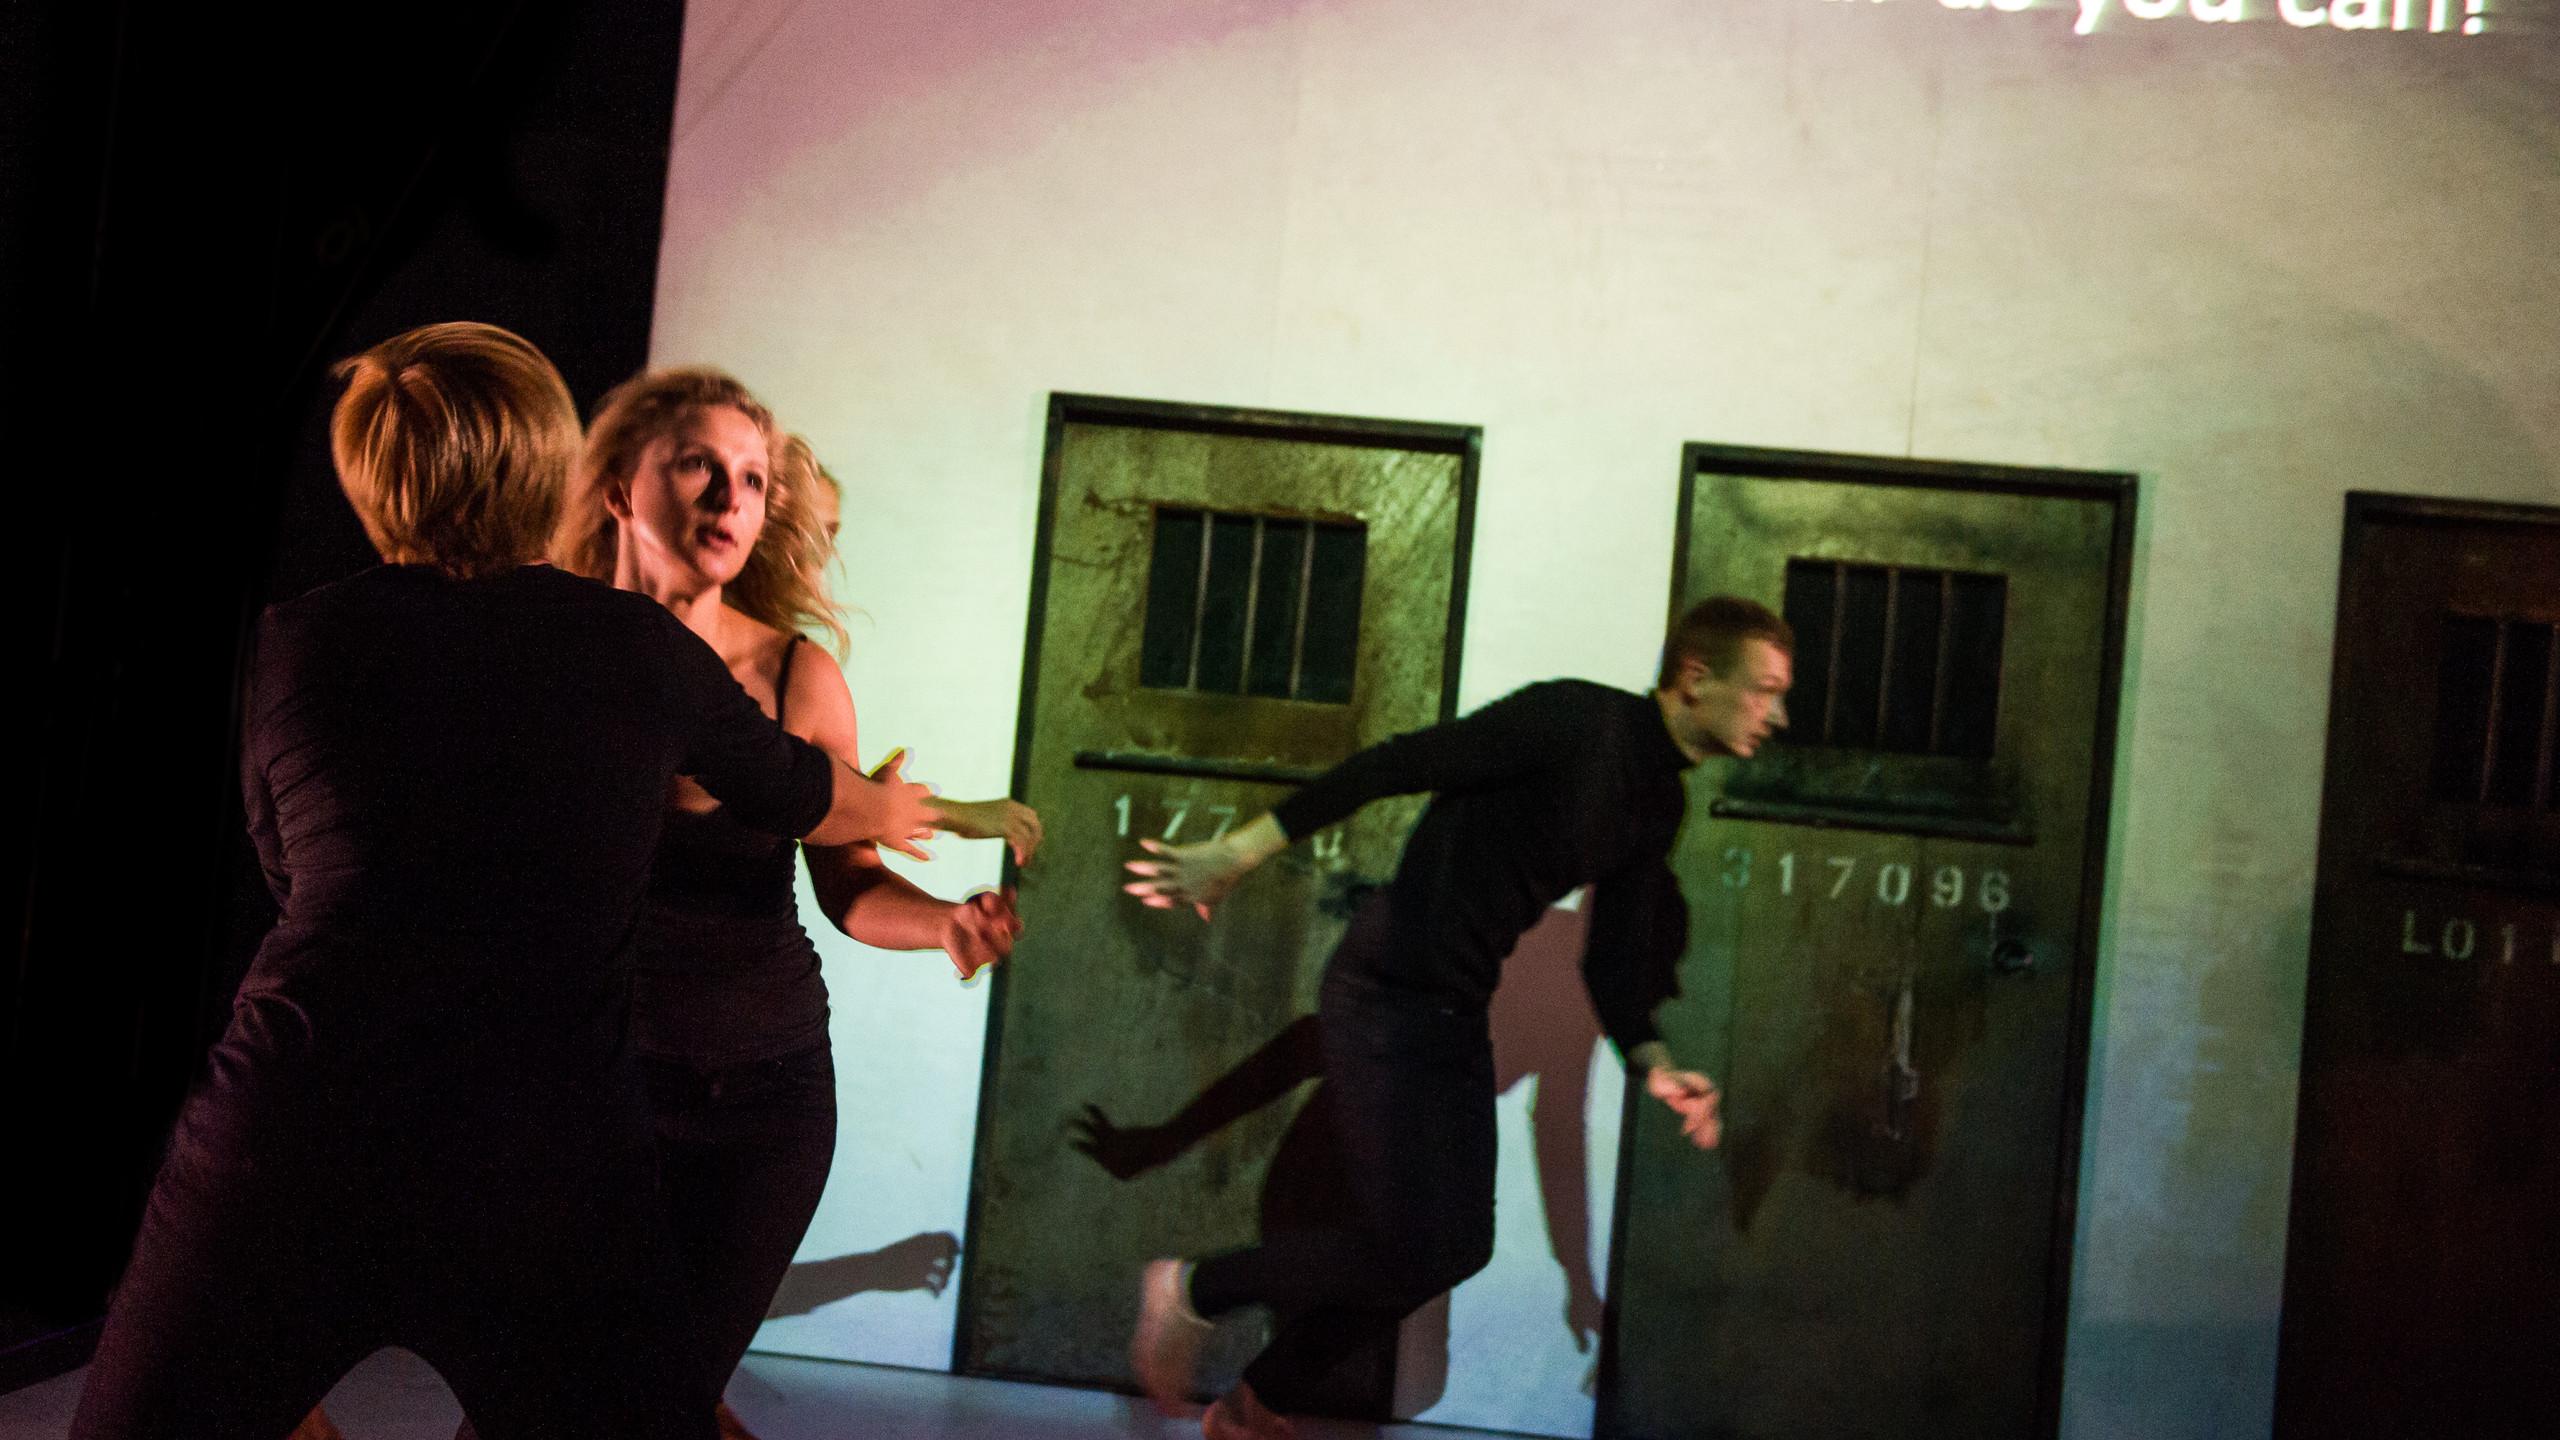 (c) Alex Brenner, Belarus Free Theatre - Burning Doors. Maryna Yurevich, Maria Alyokhina and Siarhei Kvachonak.